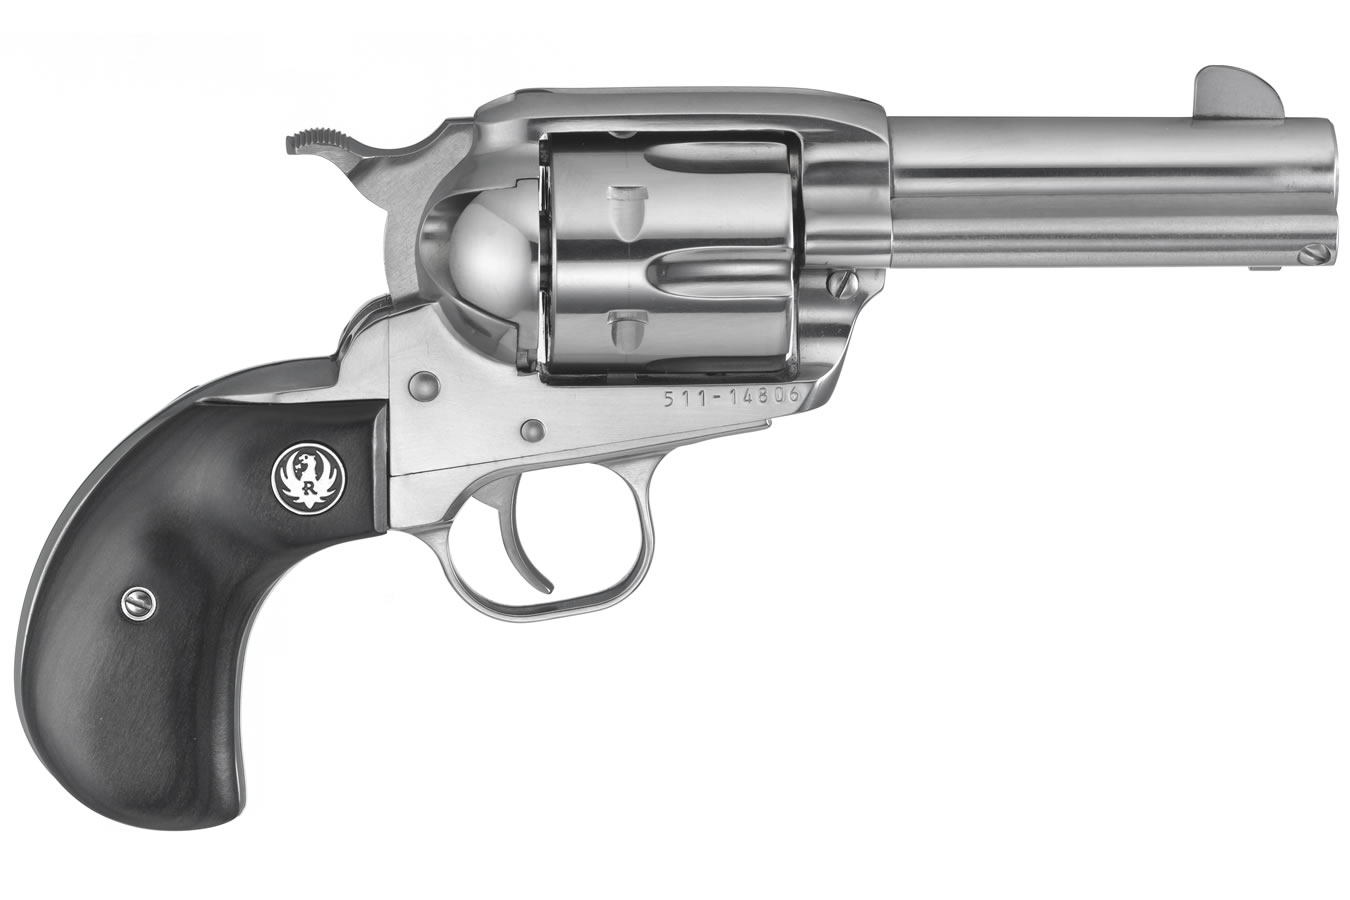 Vaquero Stainless 45 ACP Single-Action Revolver with Birdshead Grips